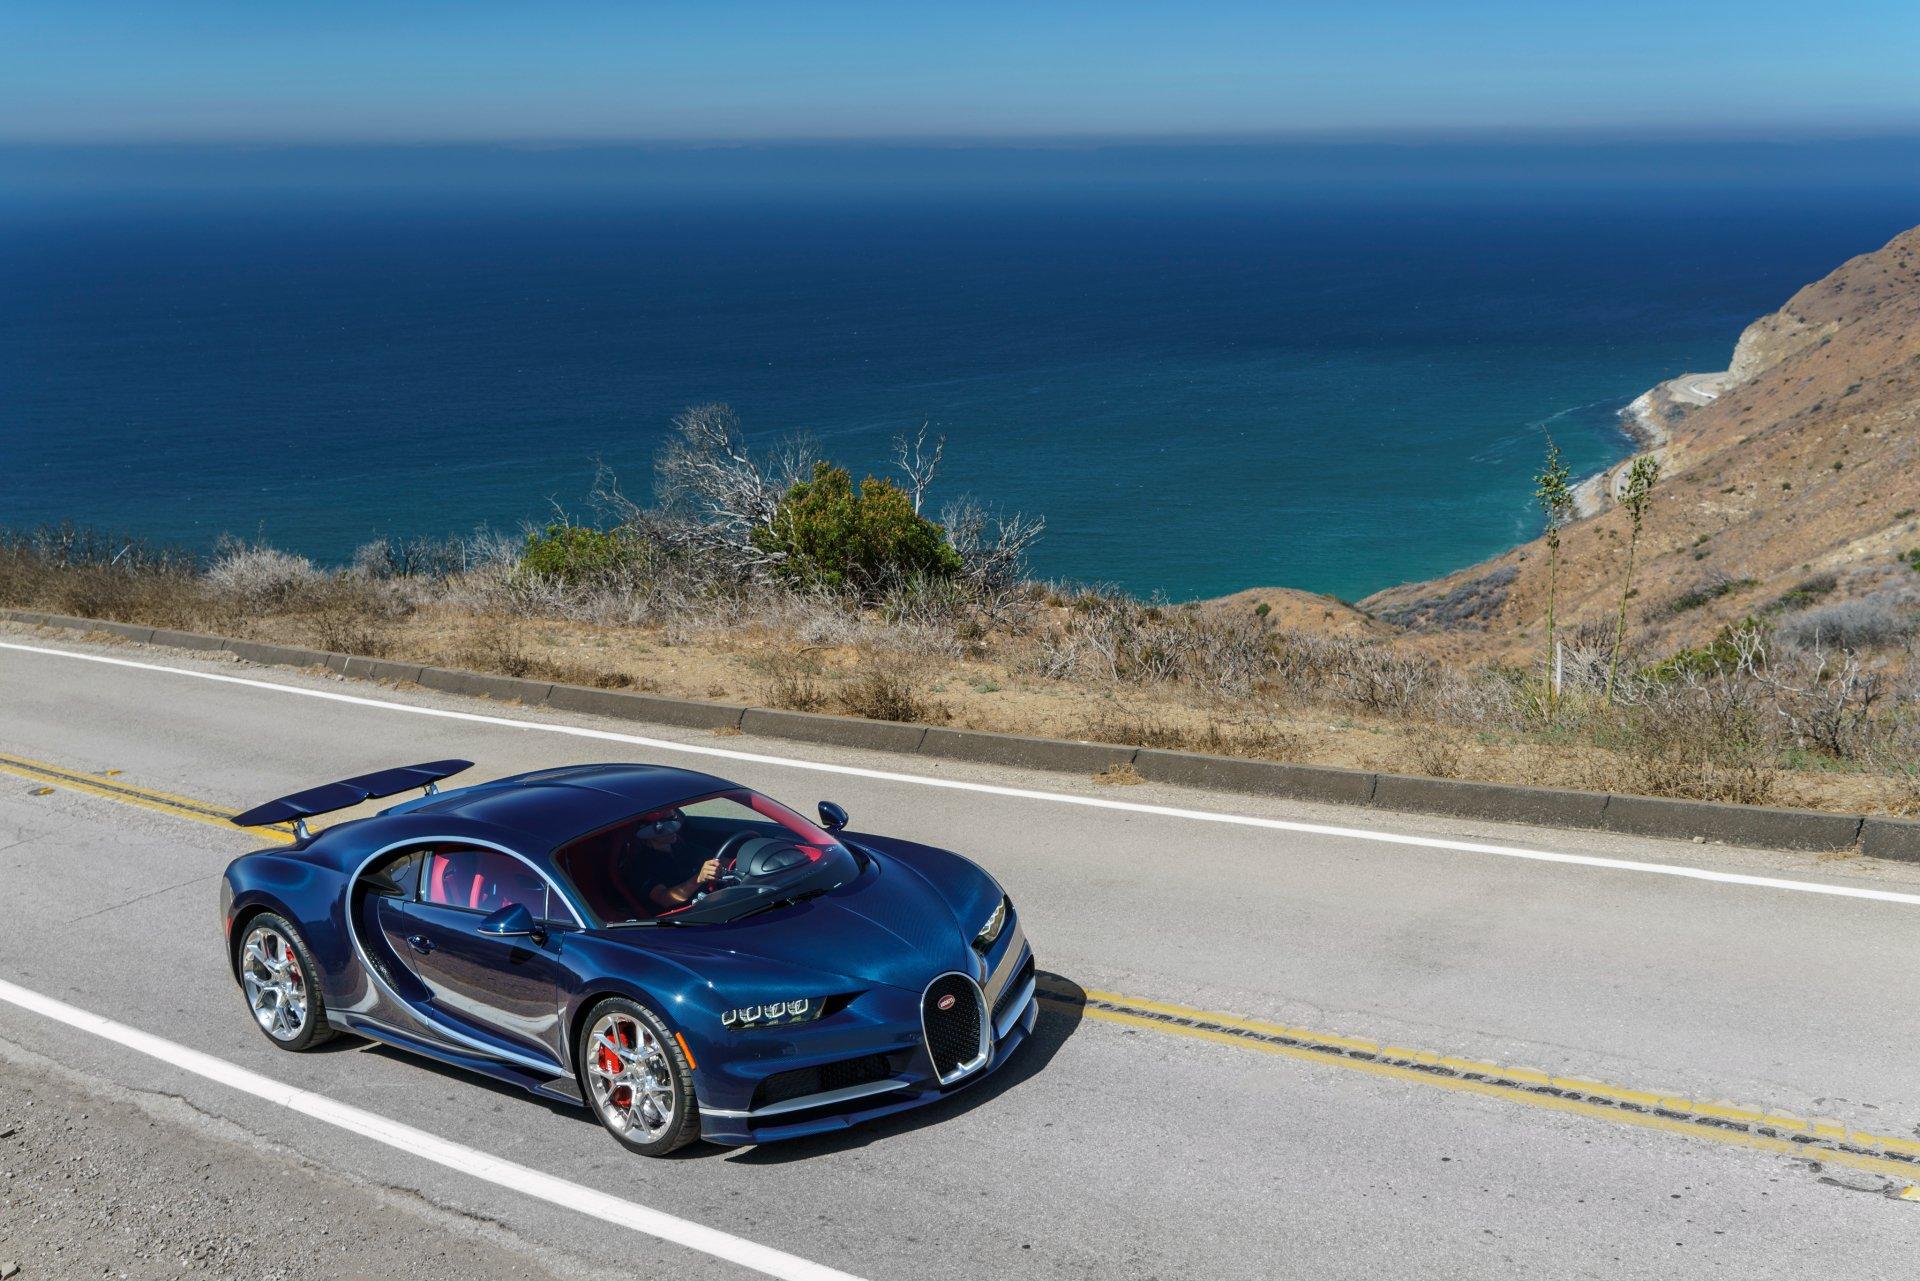 Vehicles - Bugatti Chiron  Bugatti Blue Car Car Vehicle Supercar Sport Car Wallpaper